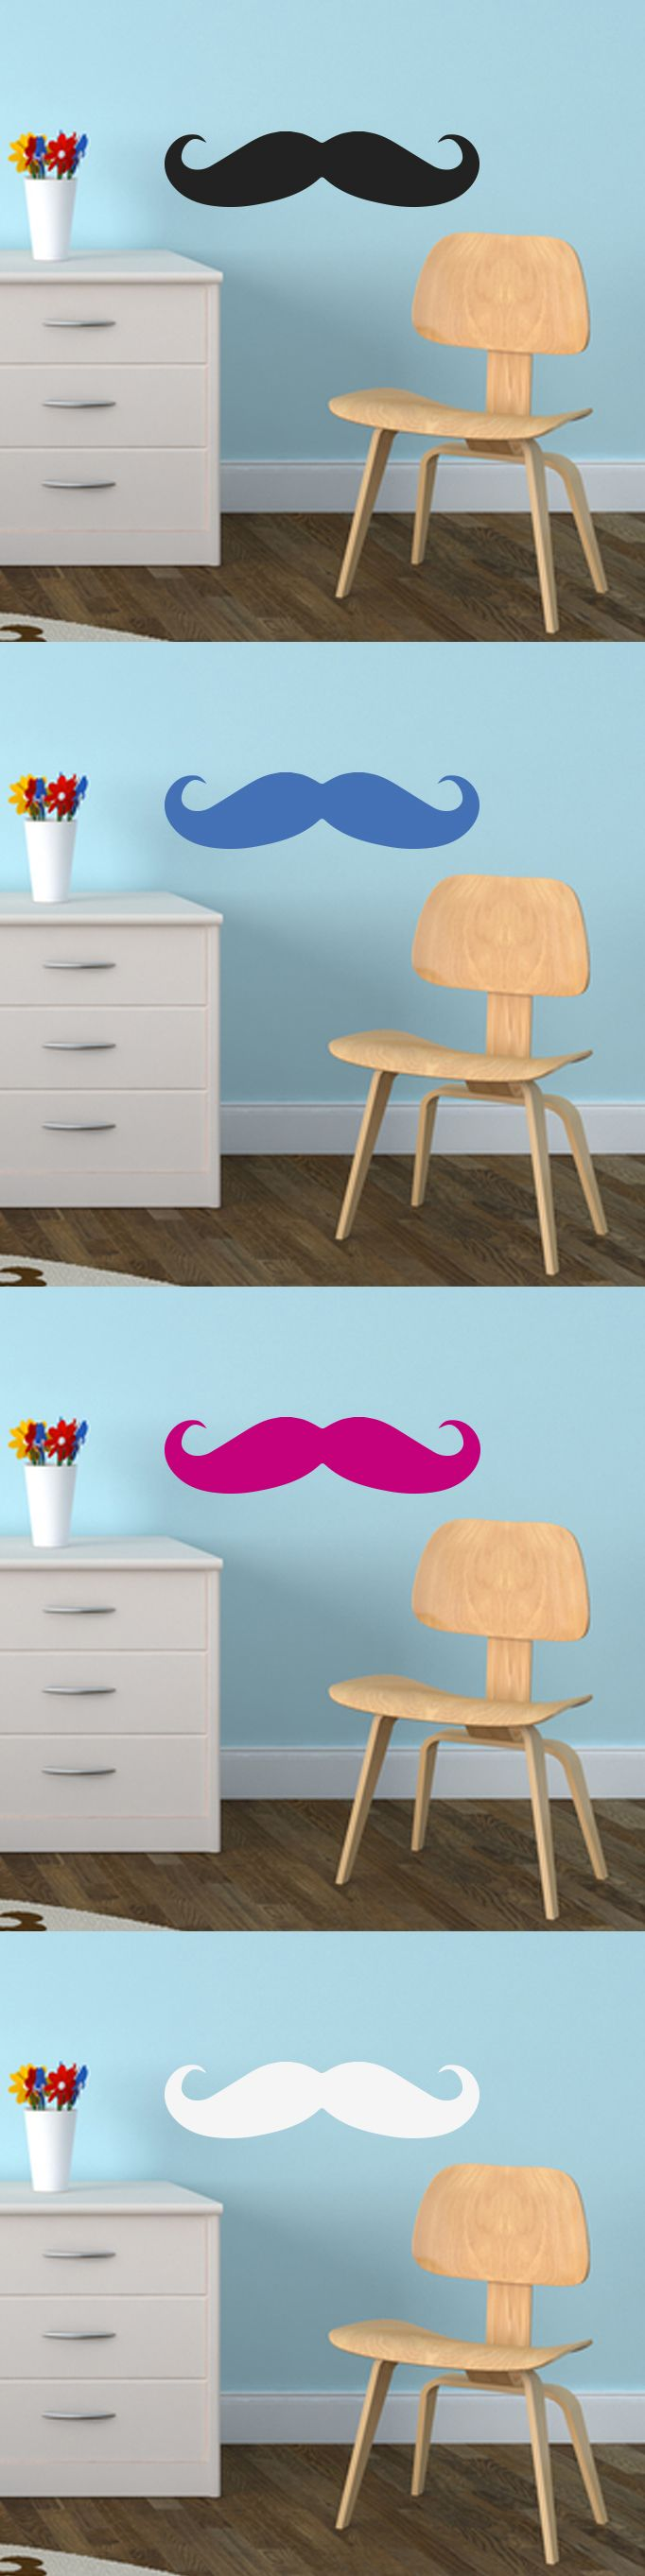 18 mejores imagenes de wall stickers en pinterest estudios de mustache decor decal vinyl wall sticker